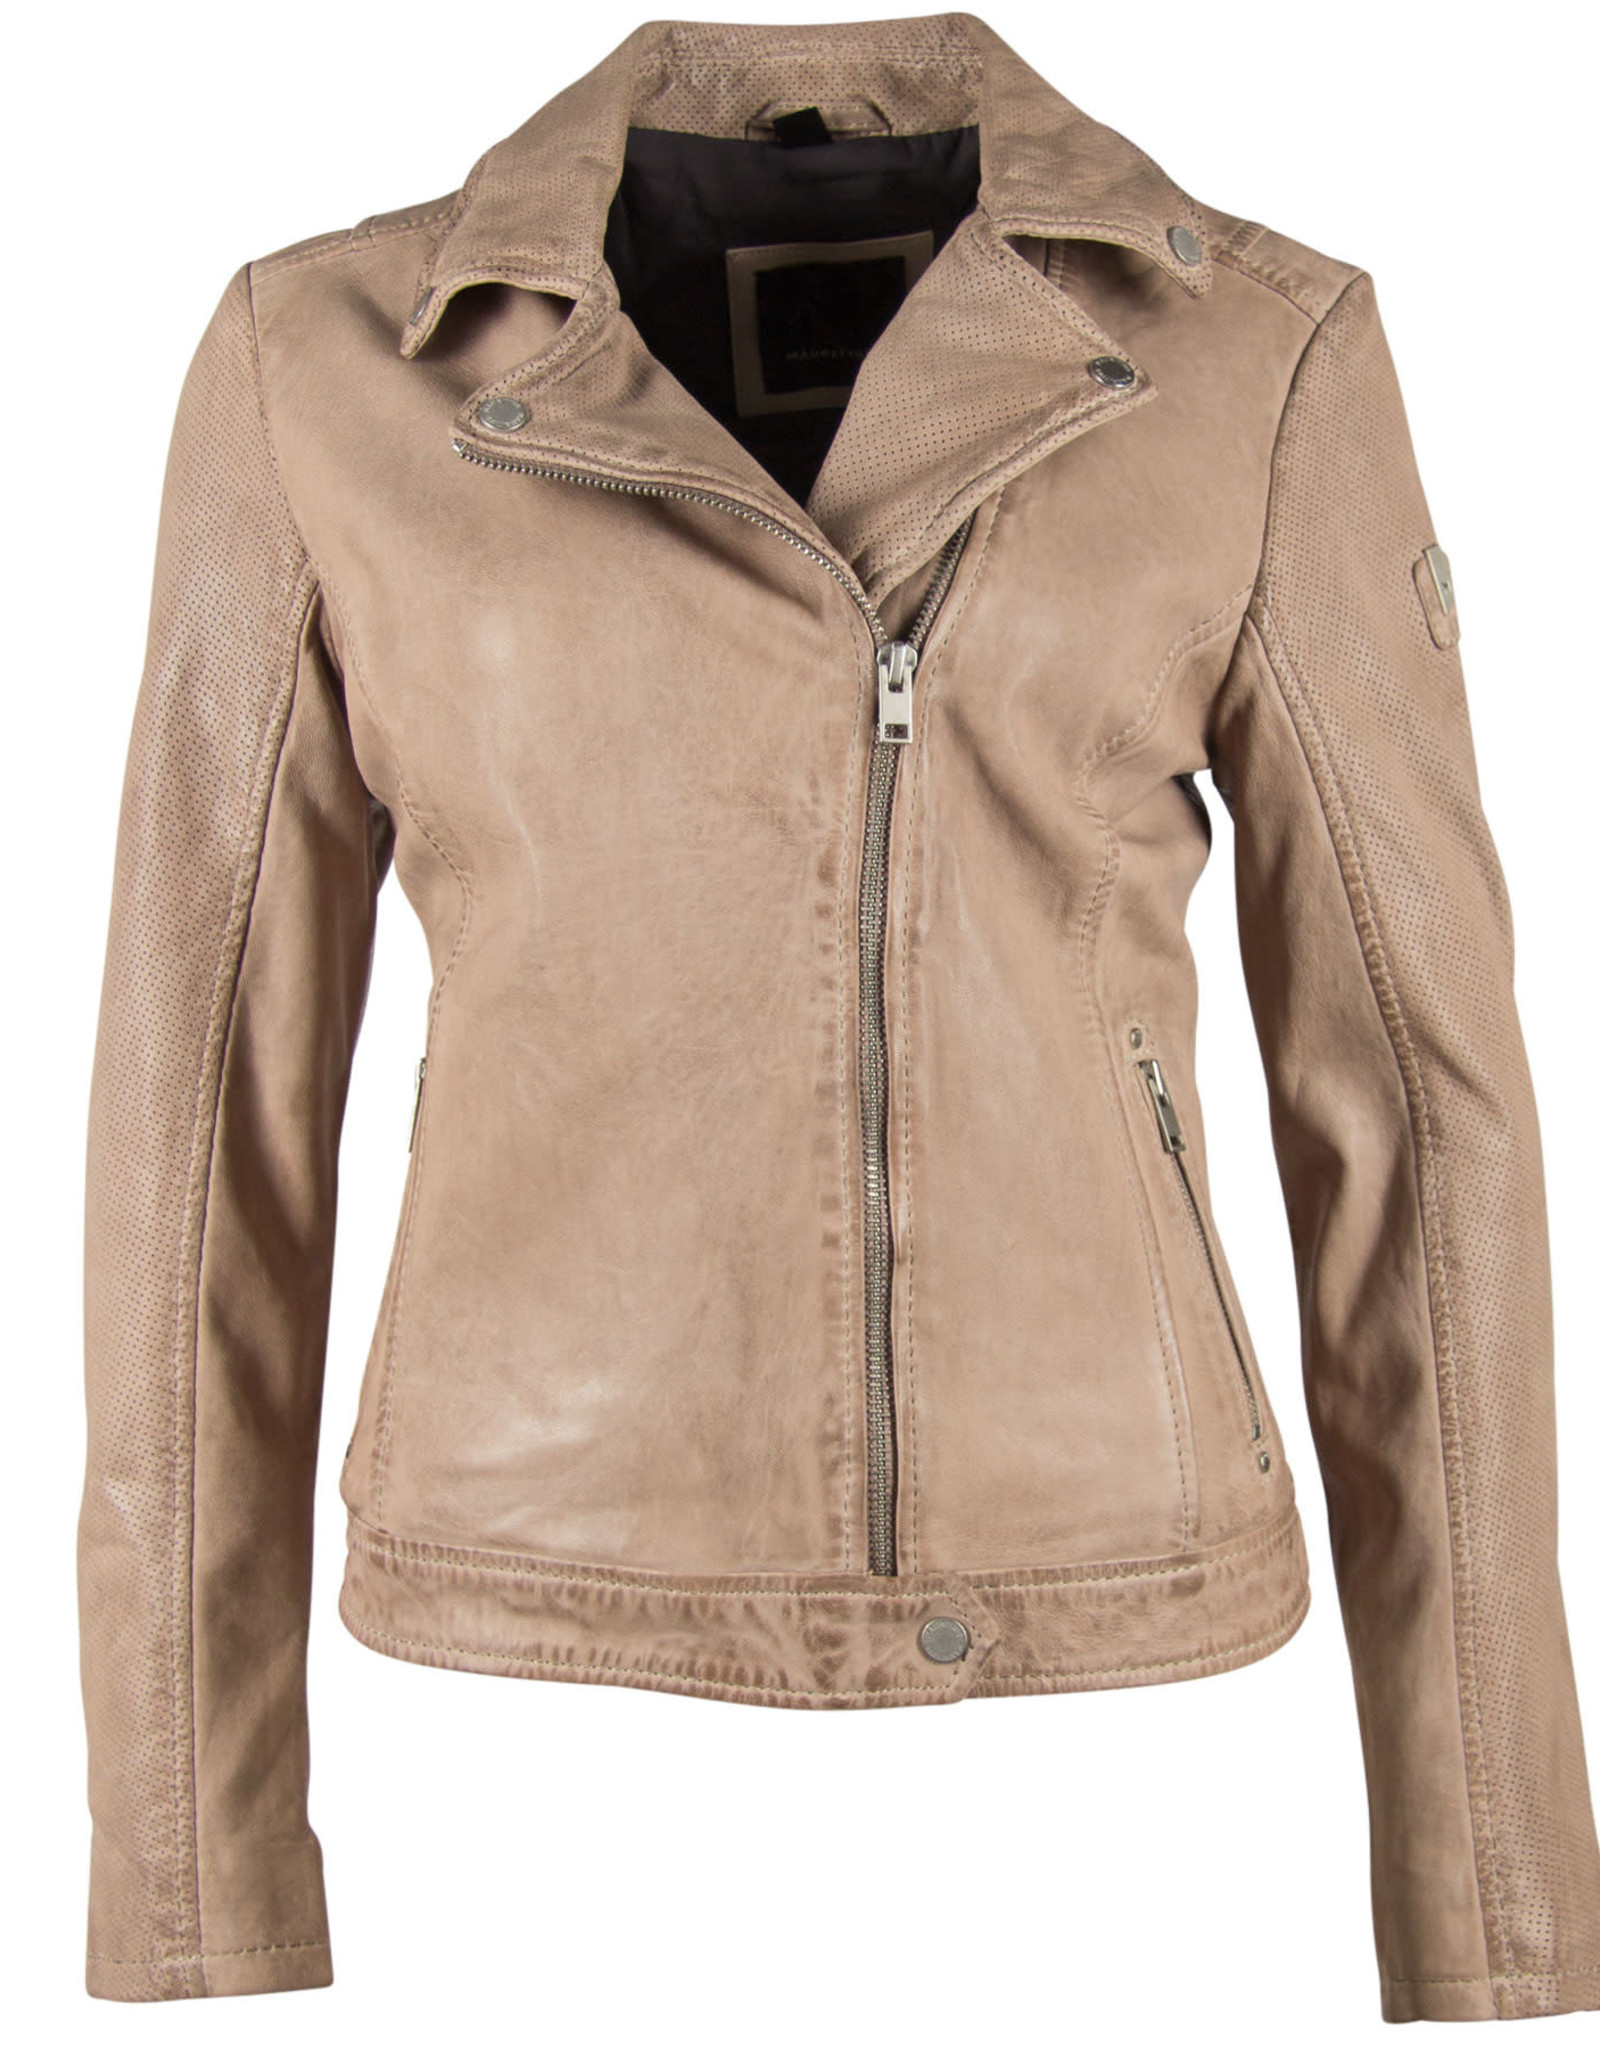 Mauritius Favour Leather Jacket